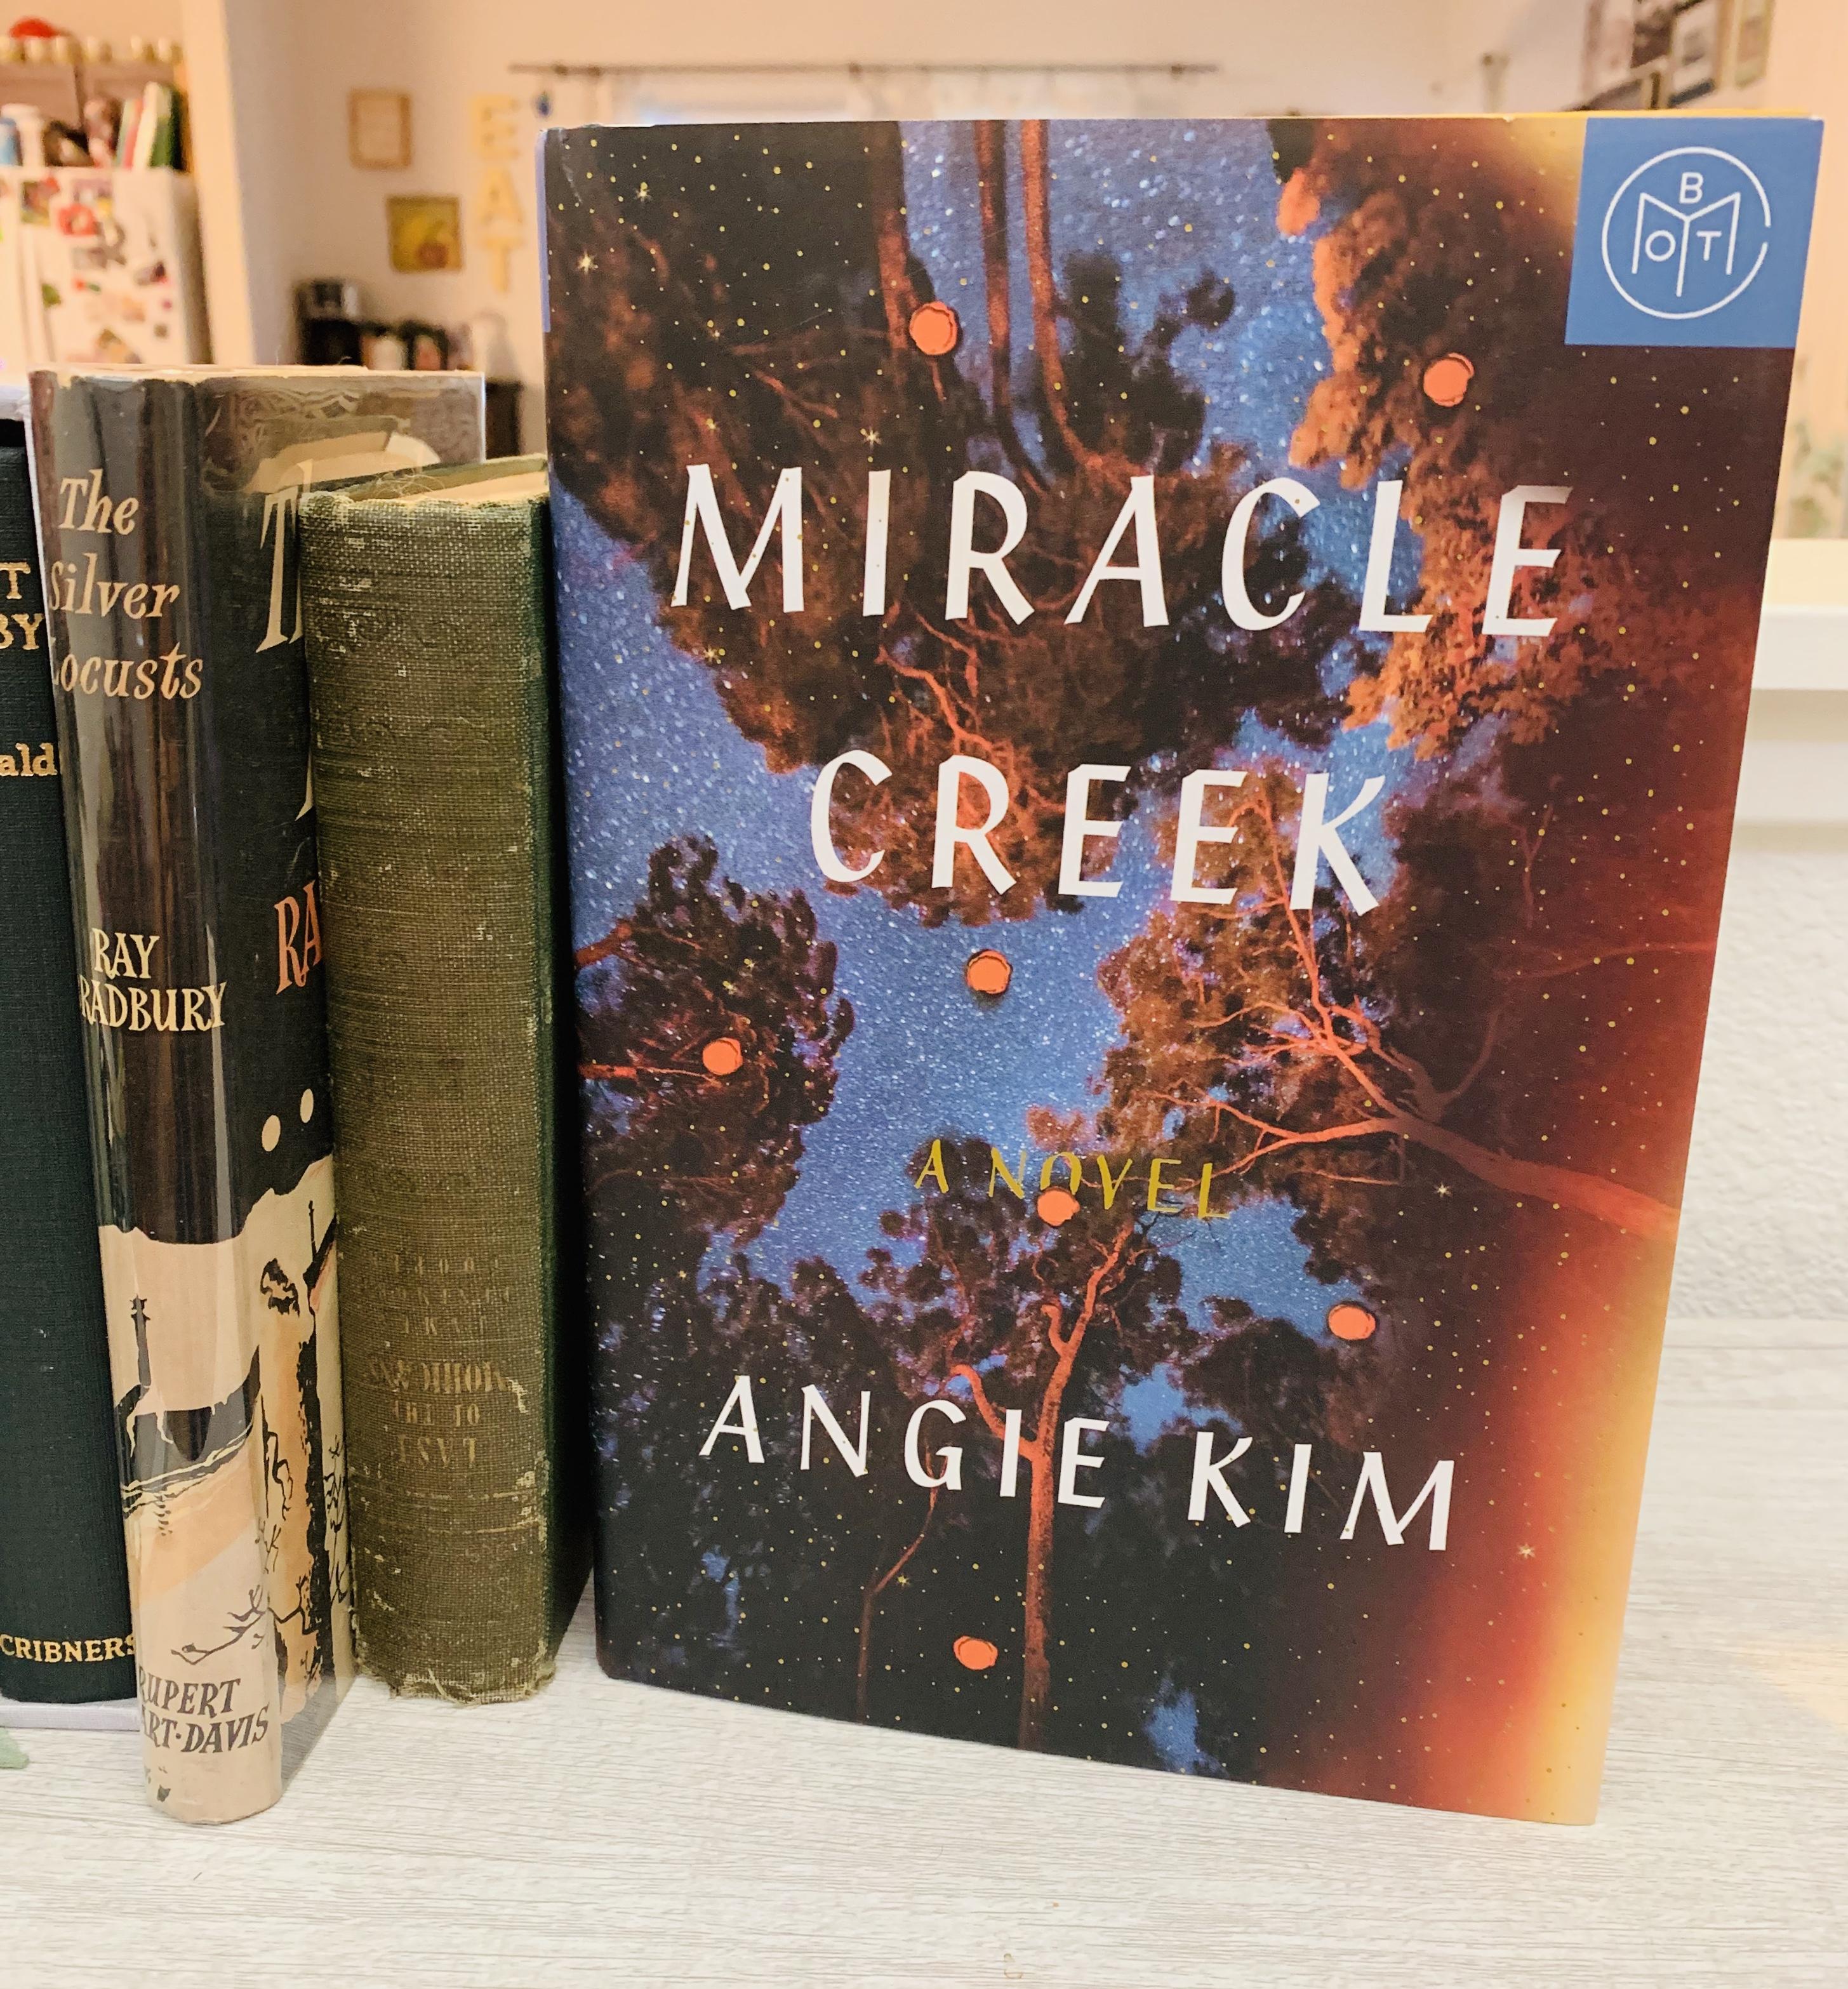 Miracle Creek book on bookshelf